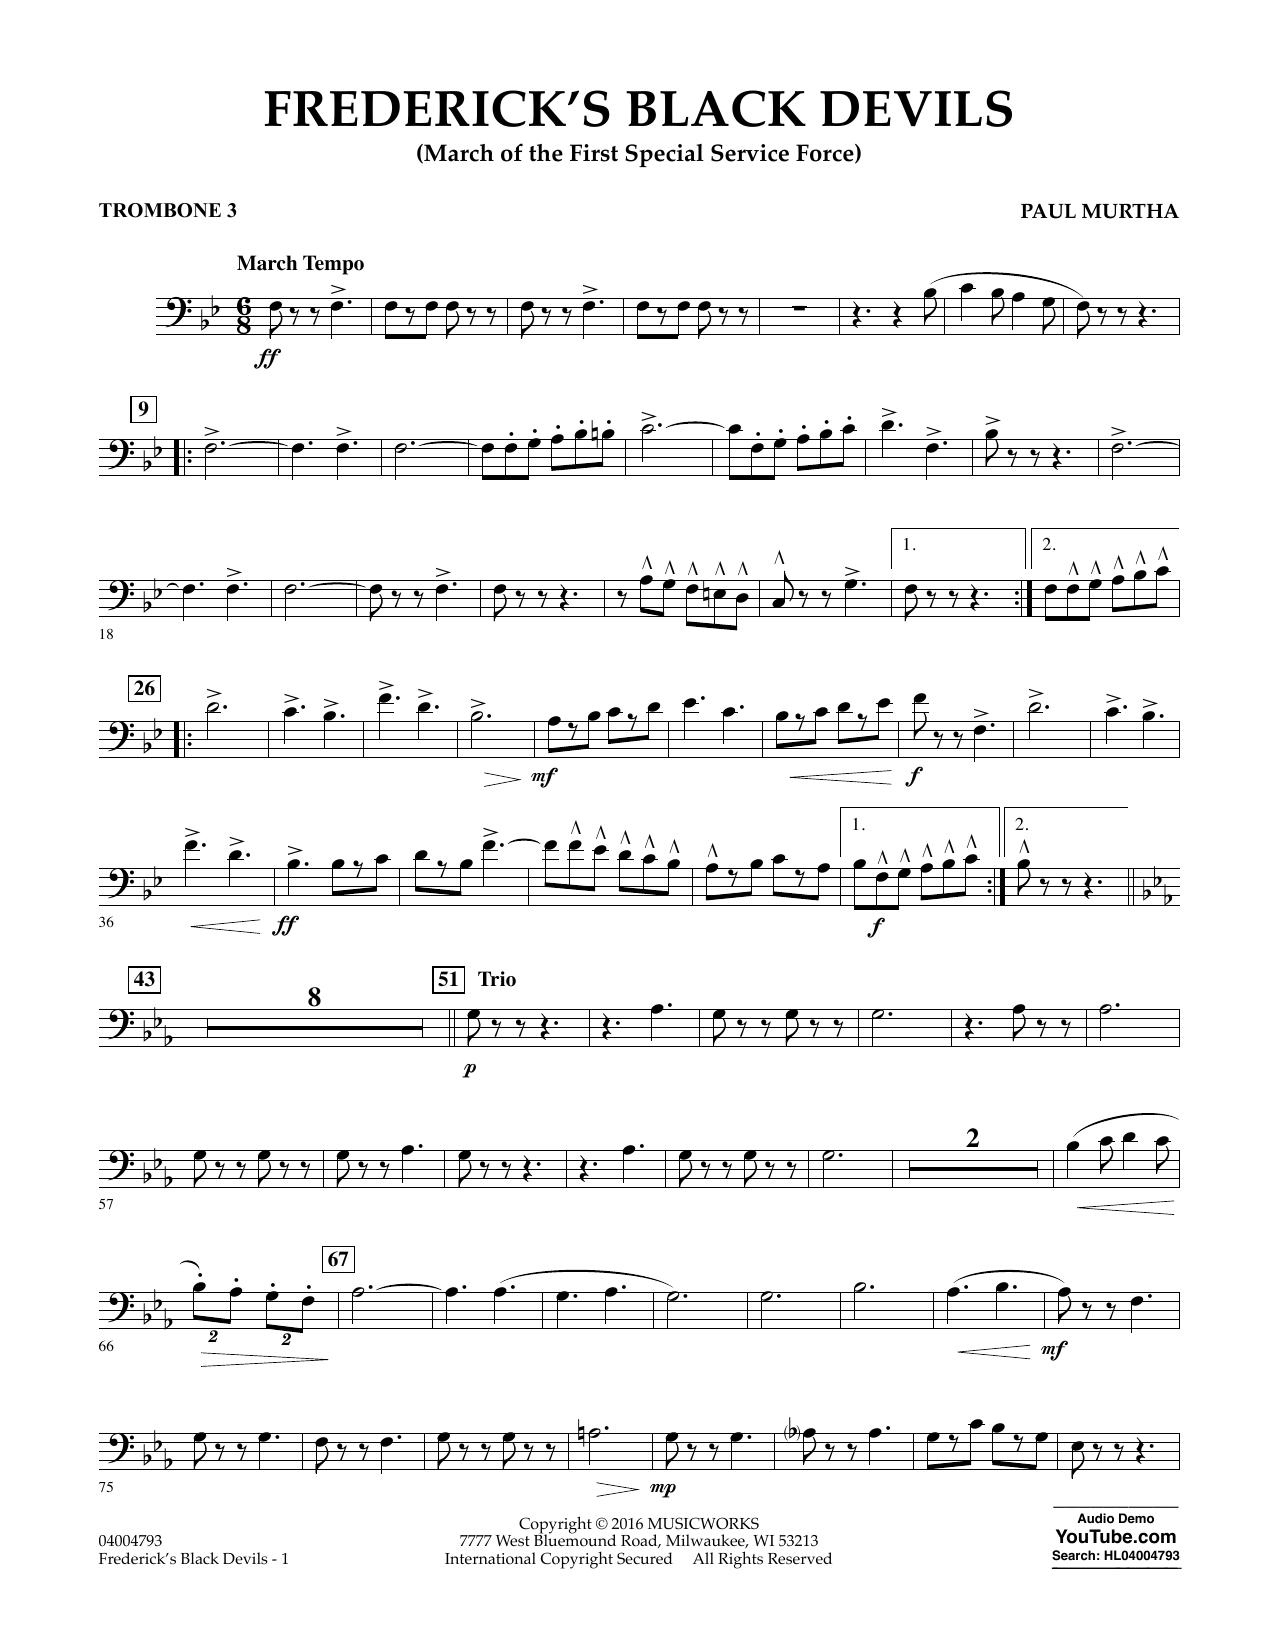 Frederick's Black Devils - Trombone 3